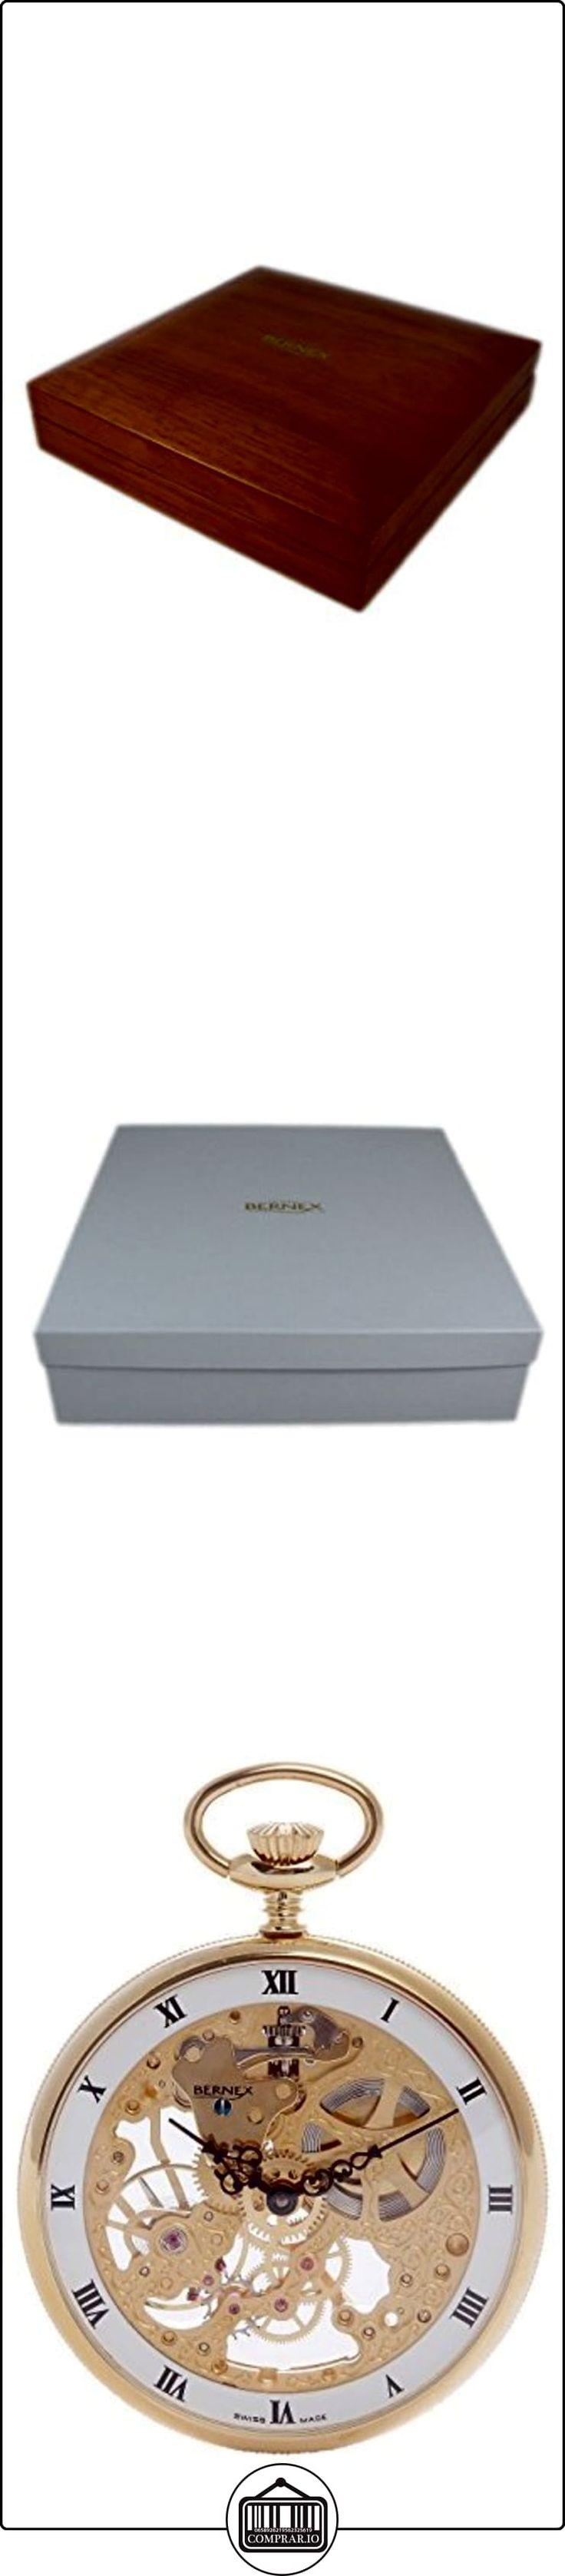 Bernex BN24101 - Reloj de caballero manual  ✿ Relojes para hombre - (Lujo) ✿